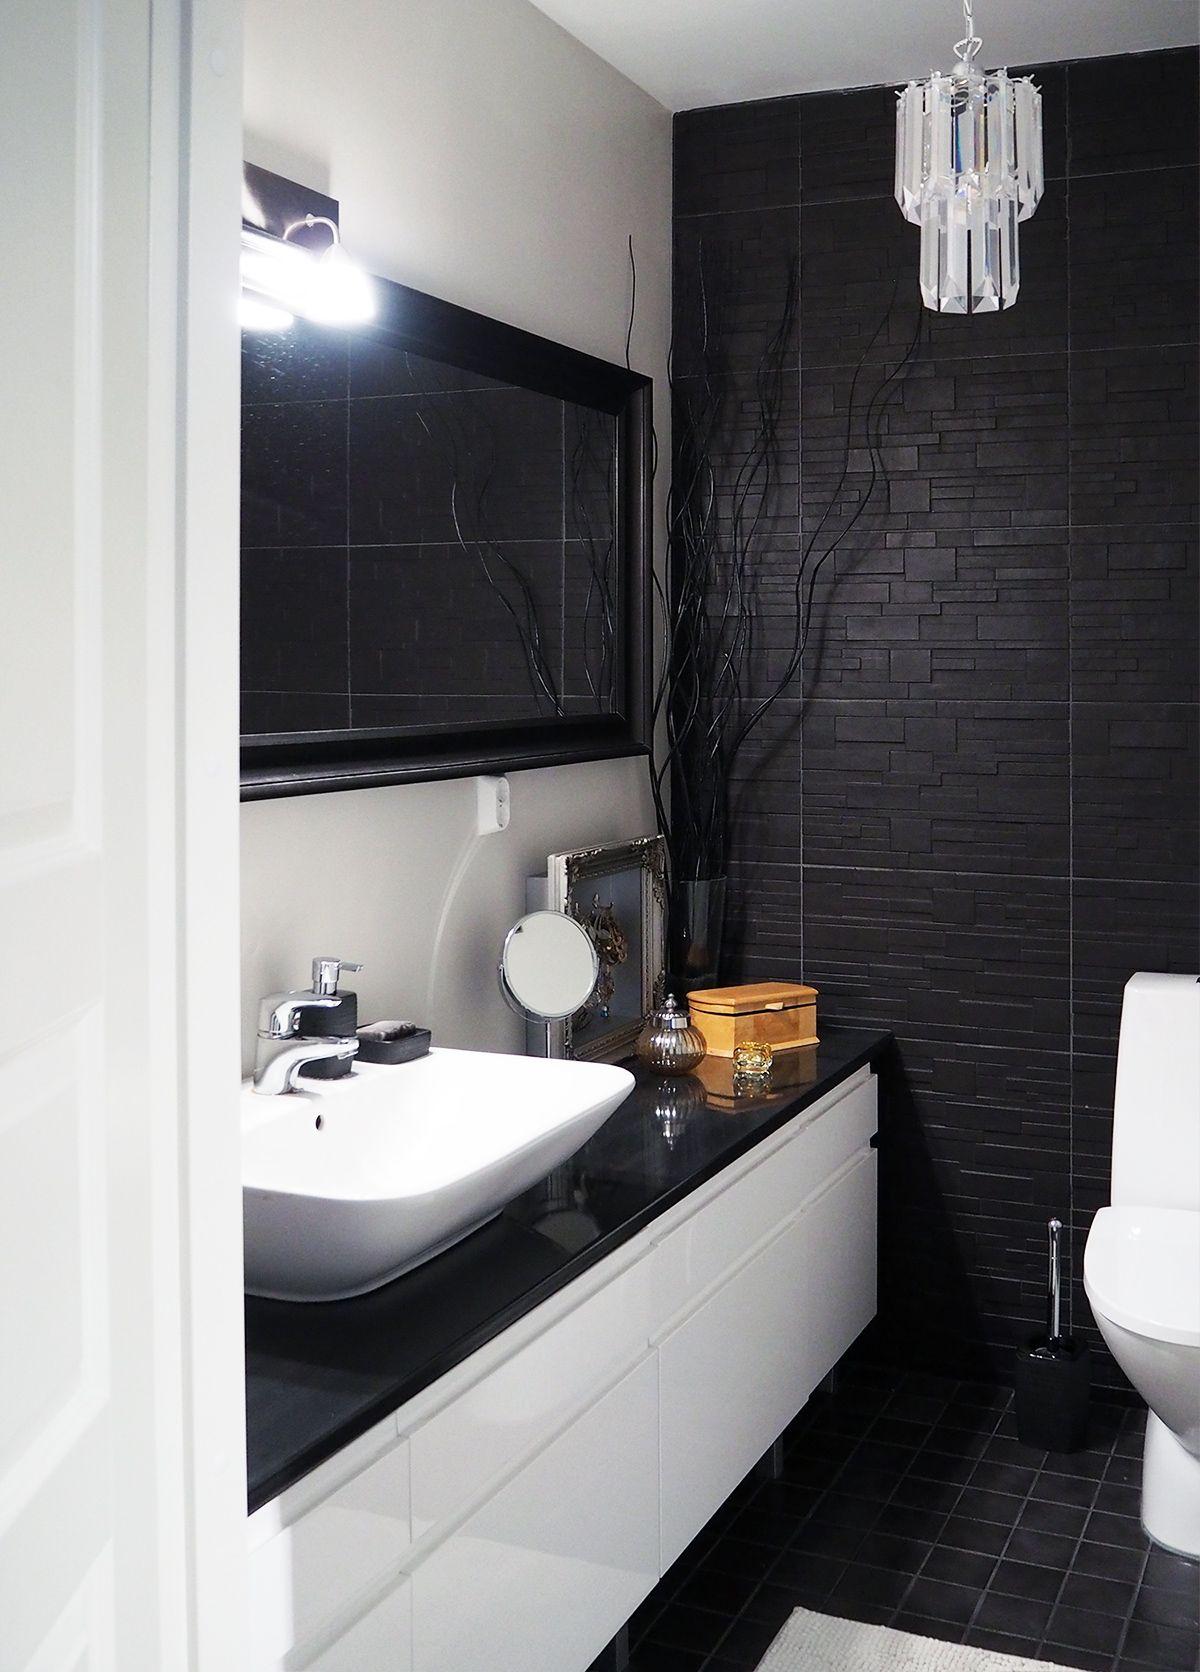 Moderni wc meht kyl l iset 54f7026f498ec414915c1083